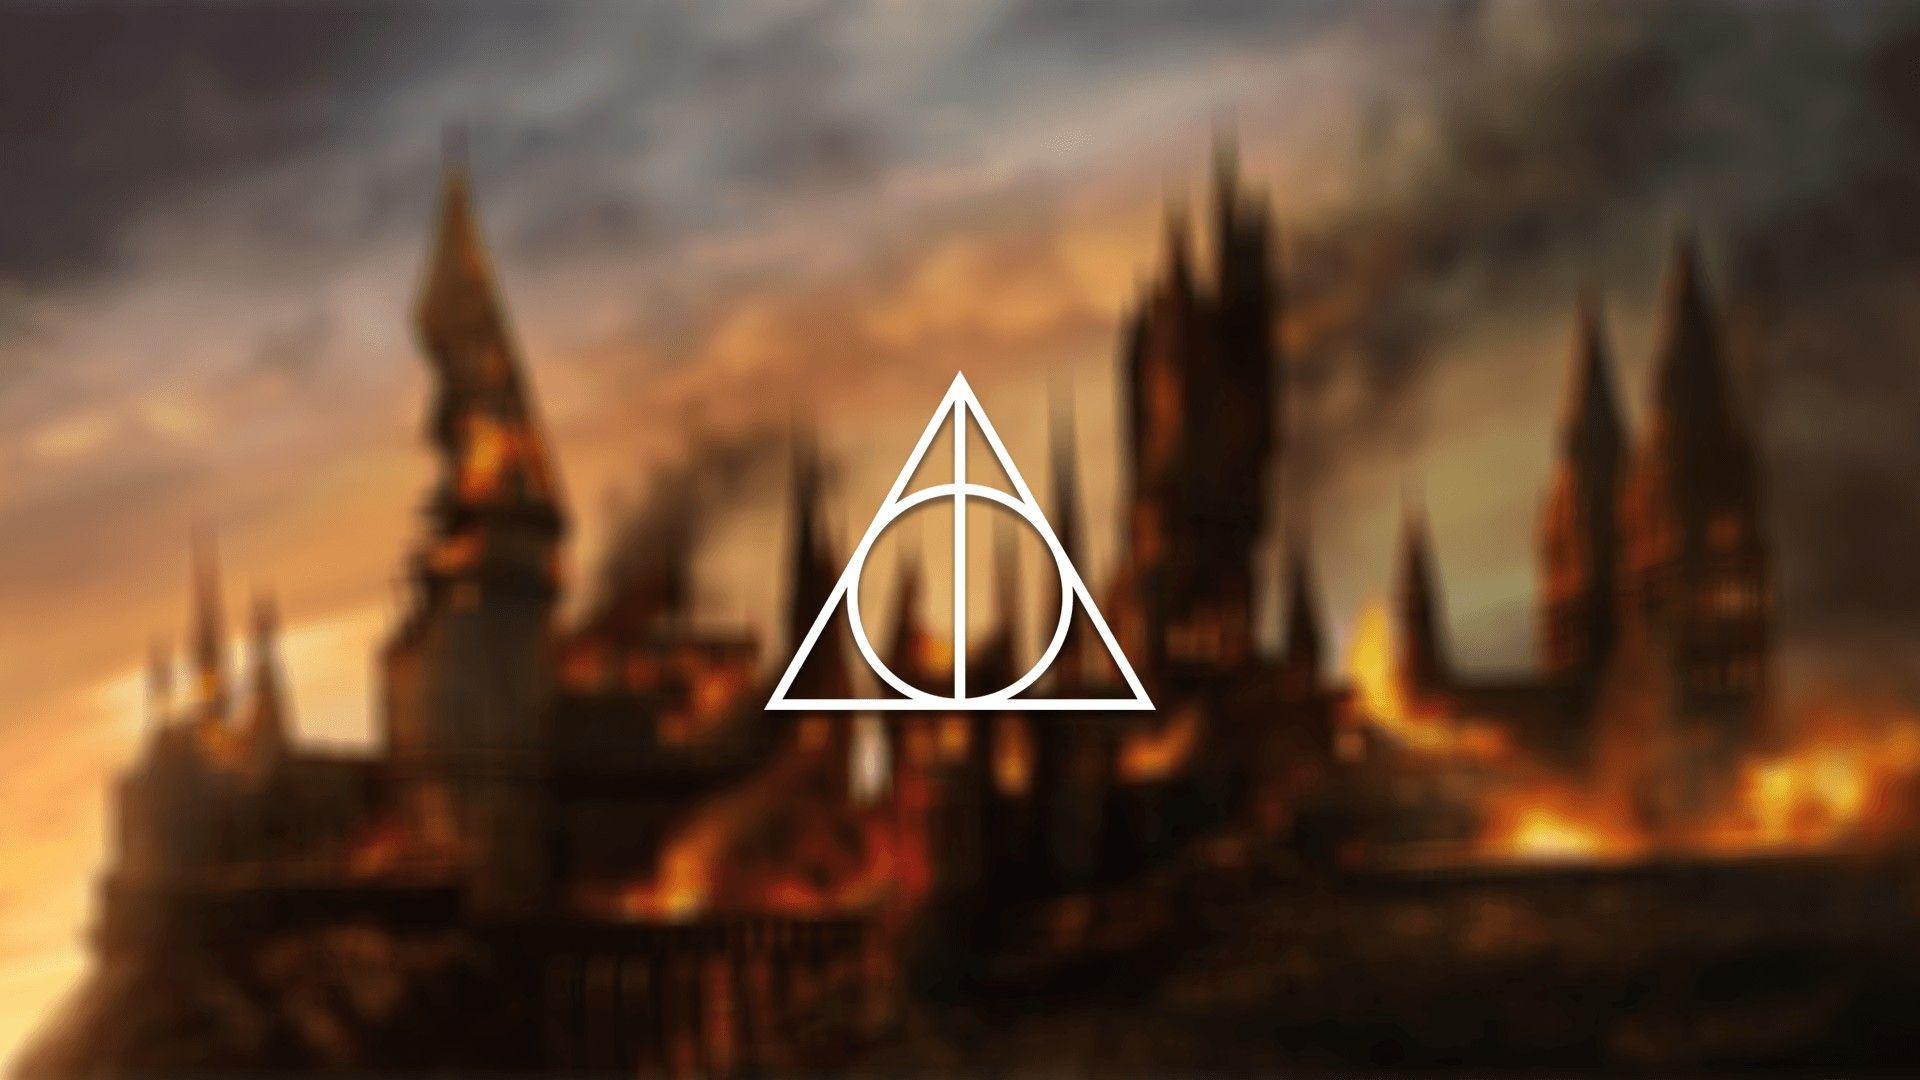 Pin By Firat Gungor On Harry Potter Harry Potter Art Harry Potter Wallpaper Hogwarts Art